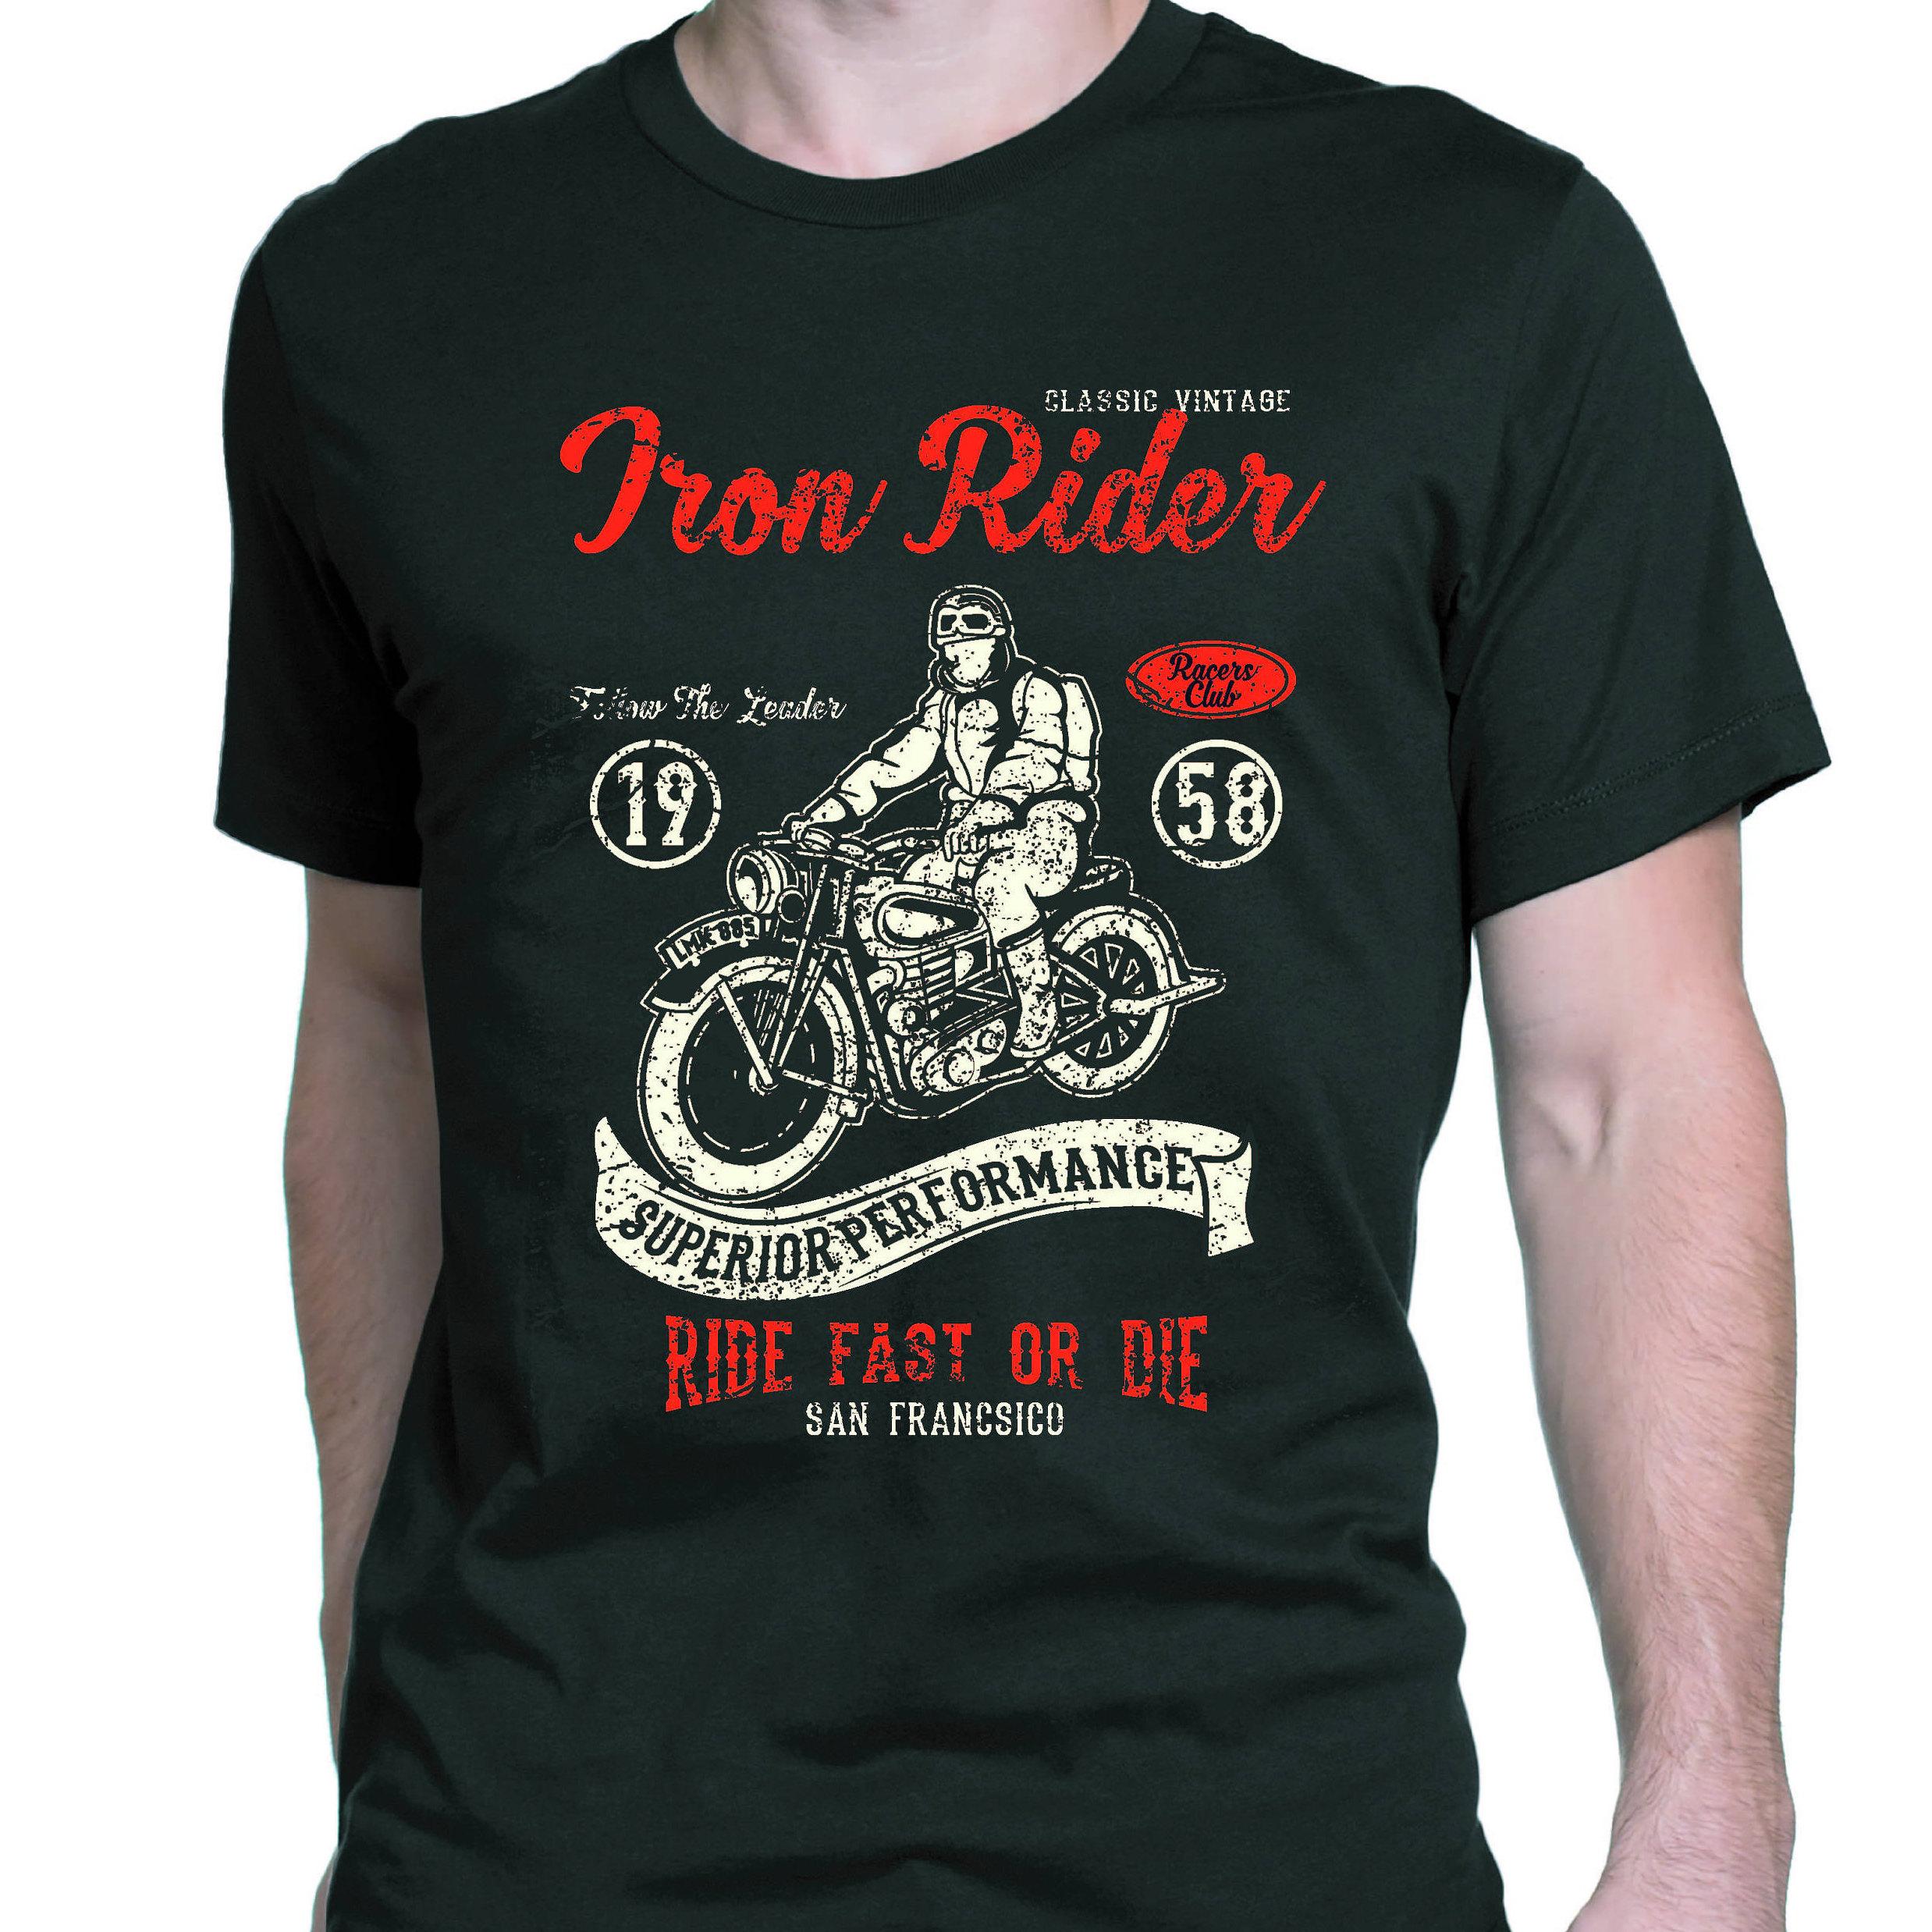 Moto T Shirt, Tshirt moto, vêtements moto moto, moto vêtements Vintage, Cafe Racer T-Shirt, 58933f